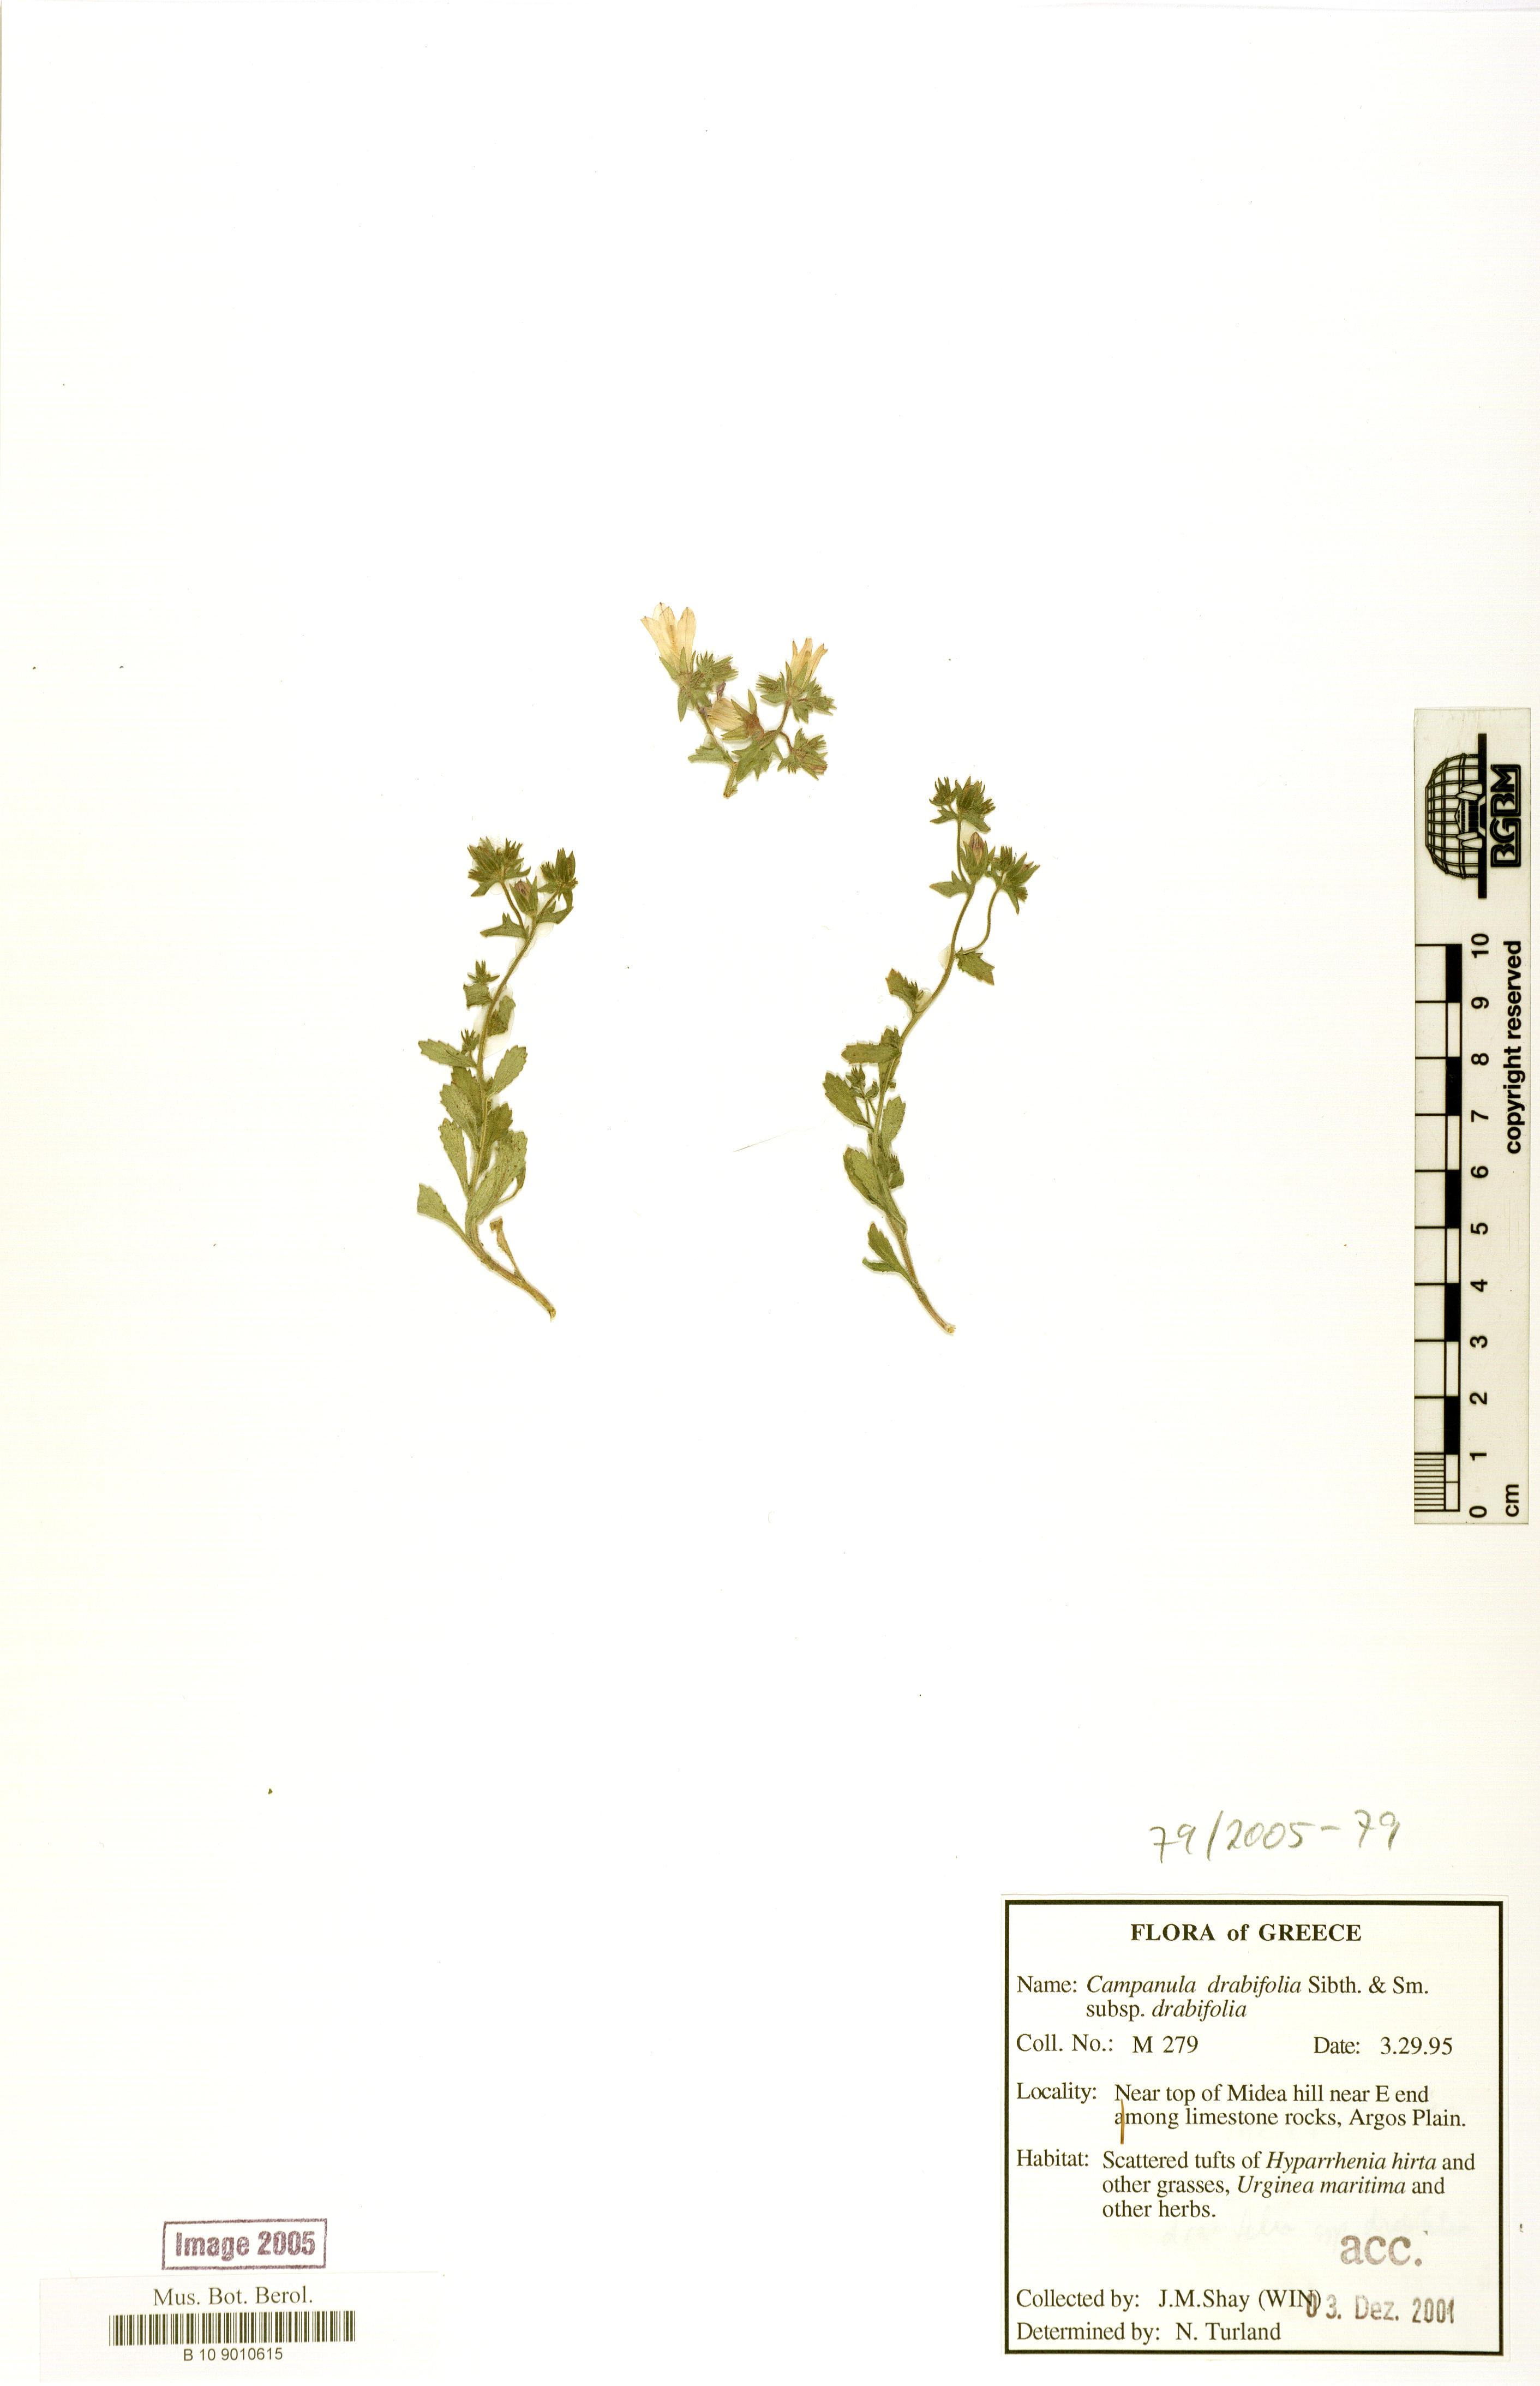 http://ww2.bgbm.org/herbarium/images/B/10/90/10/61/B_10_9010615.jpg